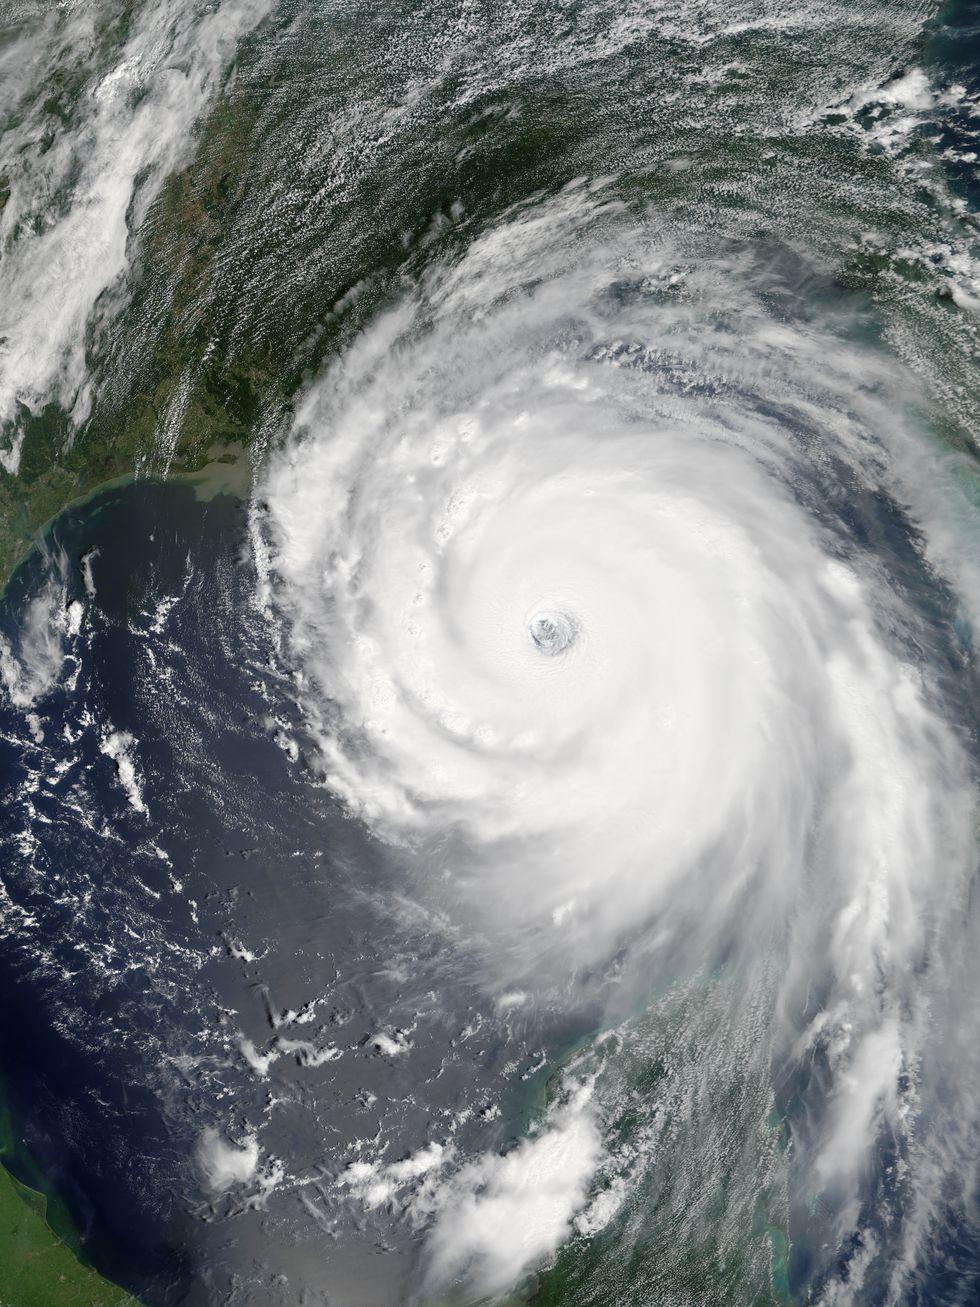 Hurricane Katrina on August 28, 2005